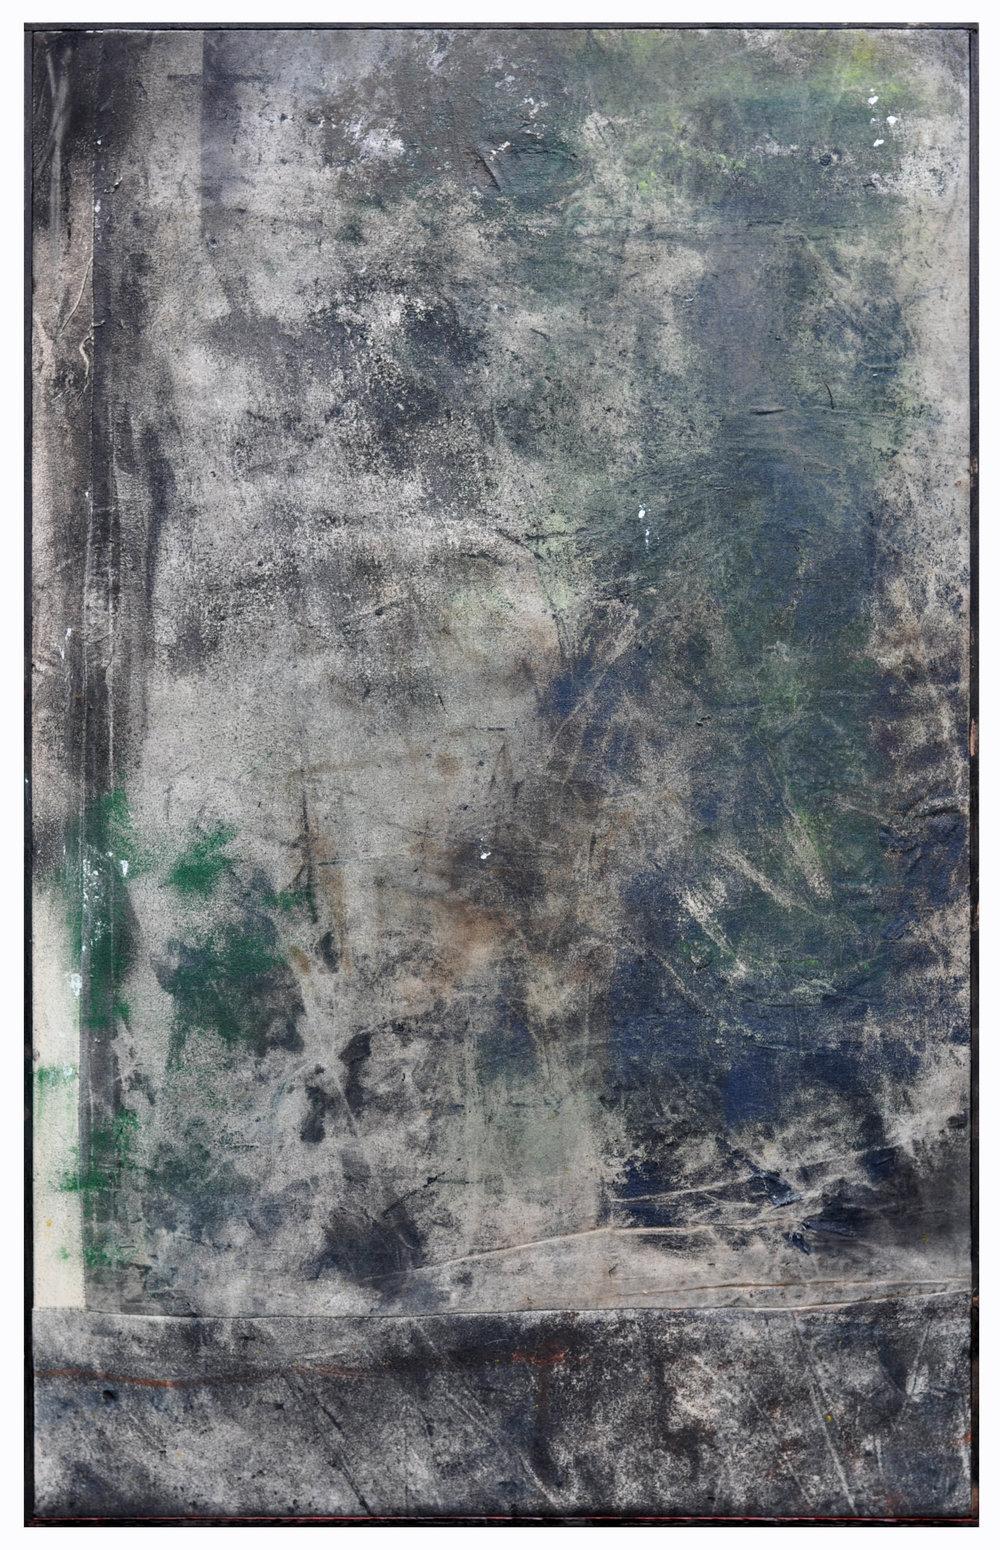 Ryan McGennisken, Everythings On Shortage 78 x 124 cm, spray paint, thred, on canvas, oak frame, available